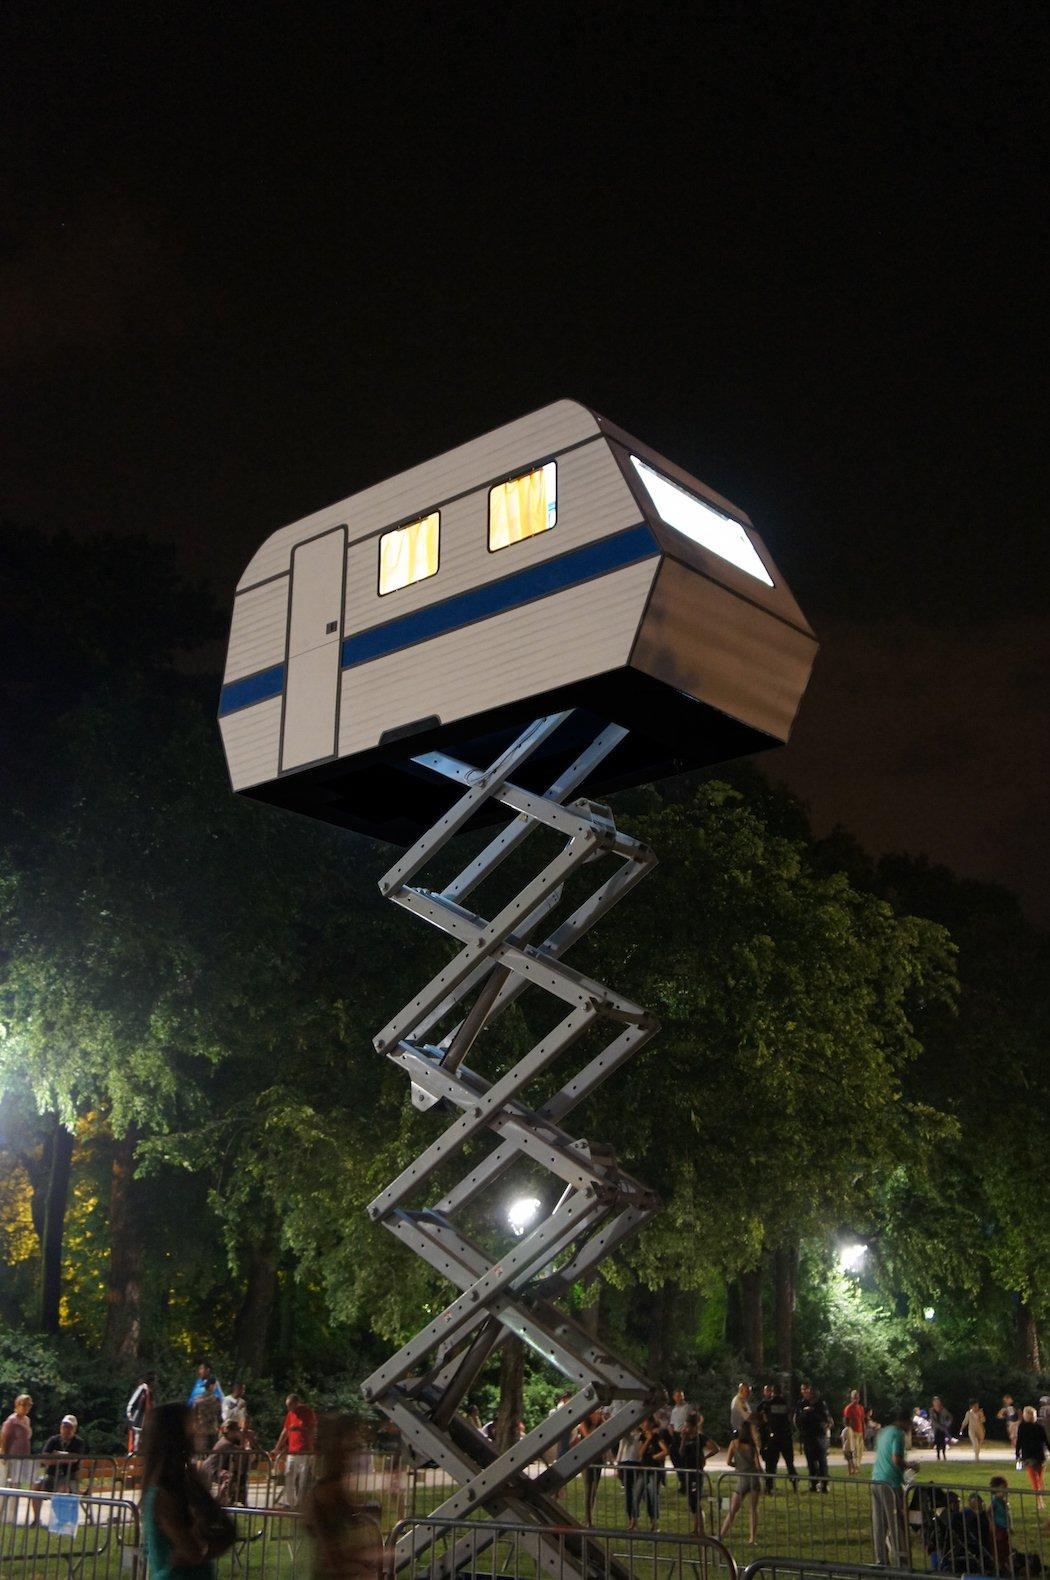 benedetto-bufalino-caravan_art_001